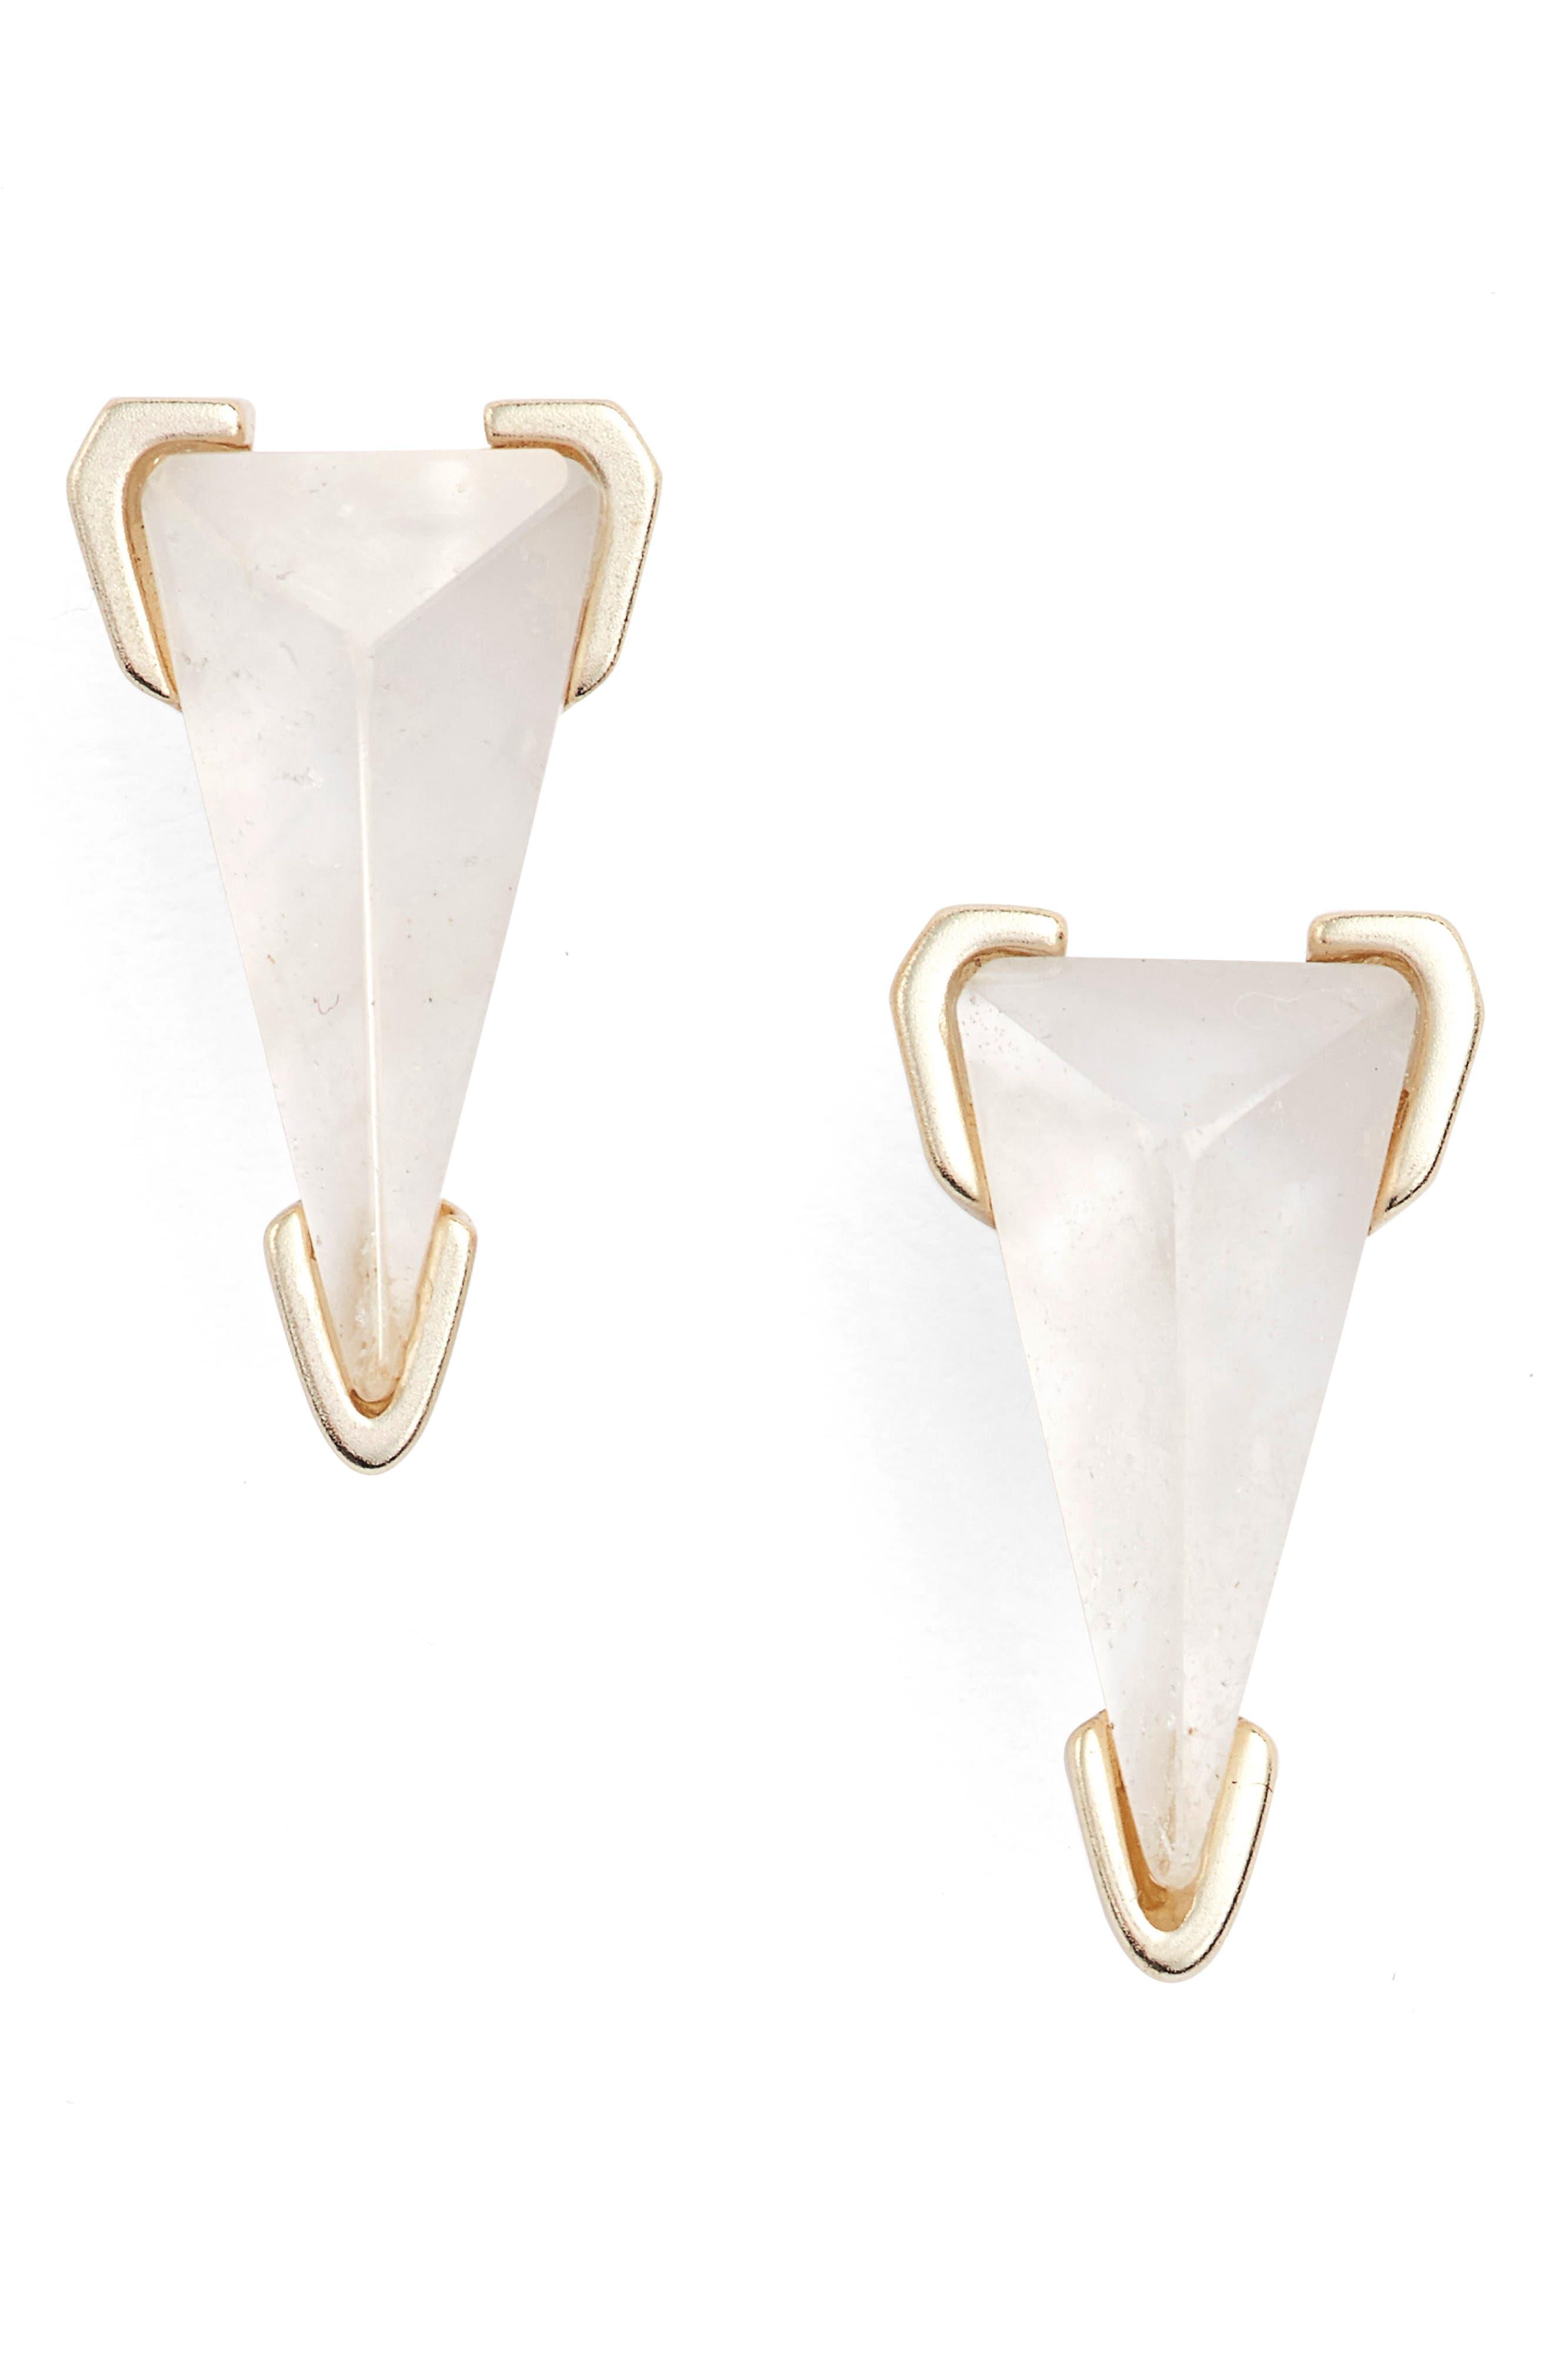 KENDRA SCOTT Honor Drop Earrings